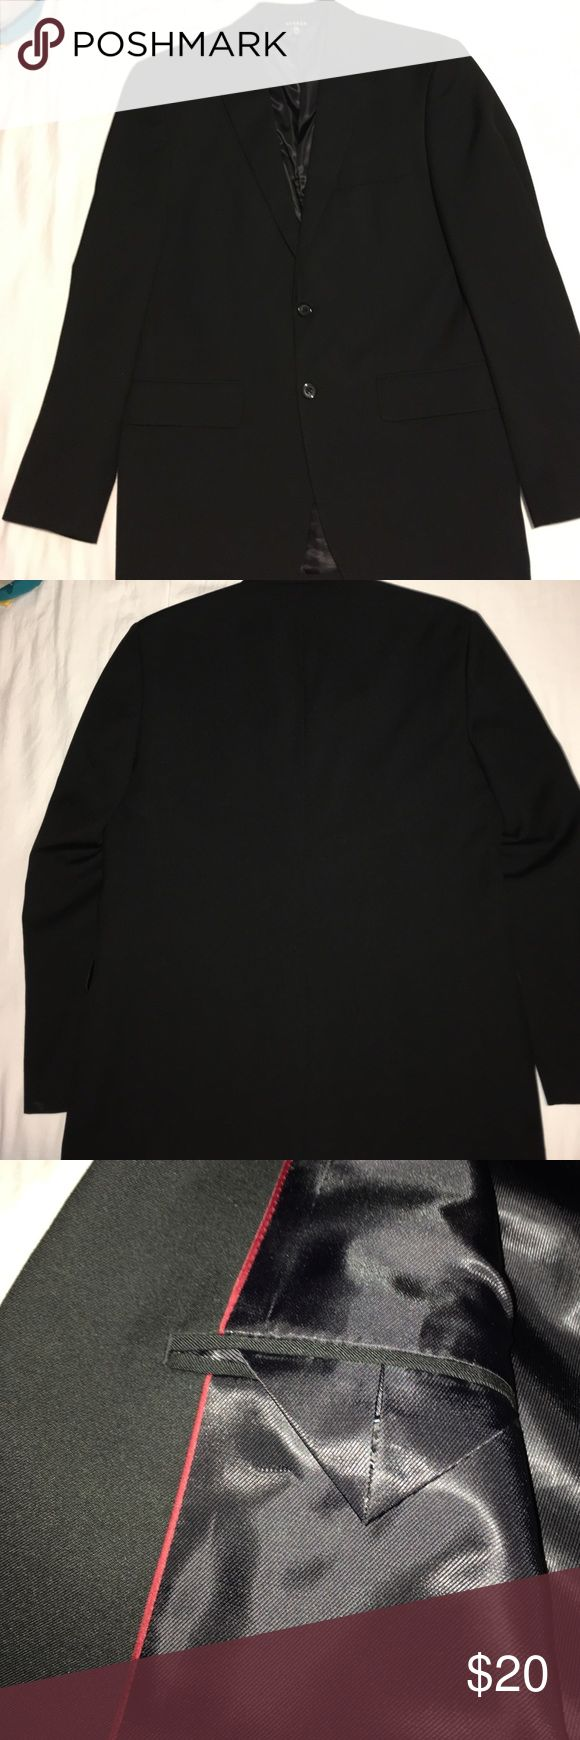 Black suit jacket 38R Black suit jacket 38R, like new, no flaws. George Suits & Blazers Suits